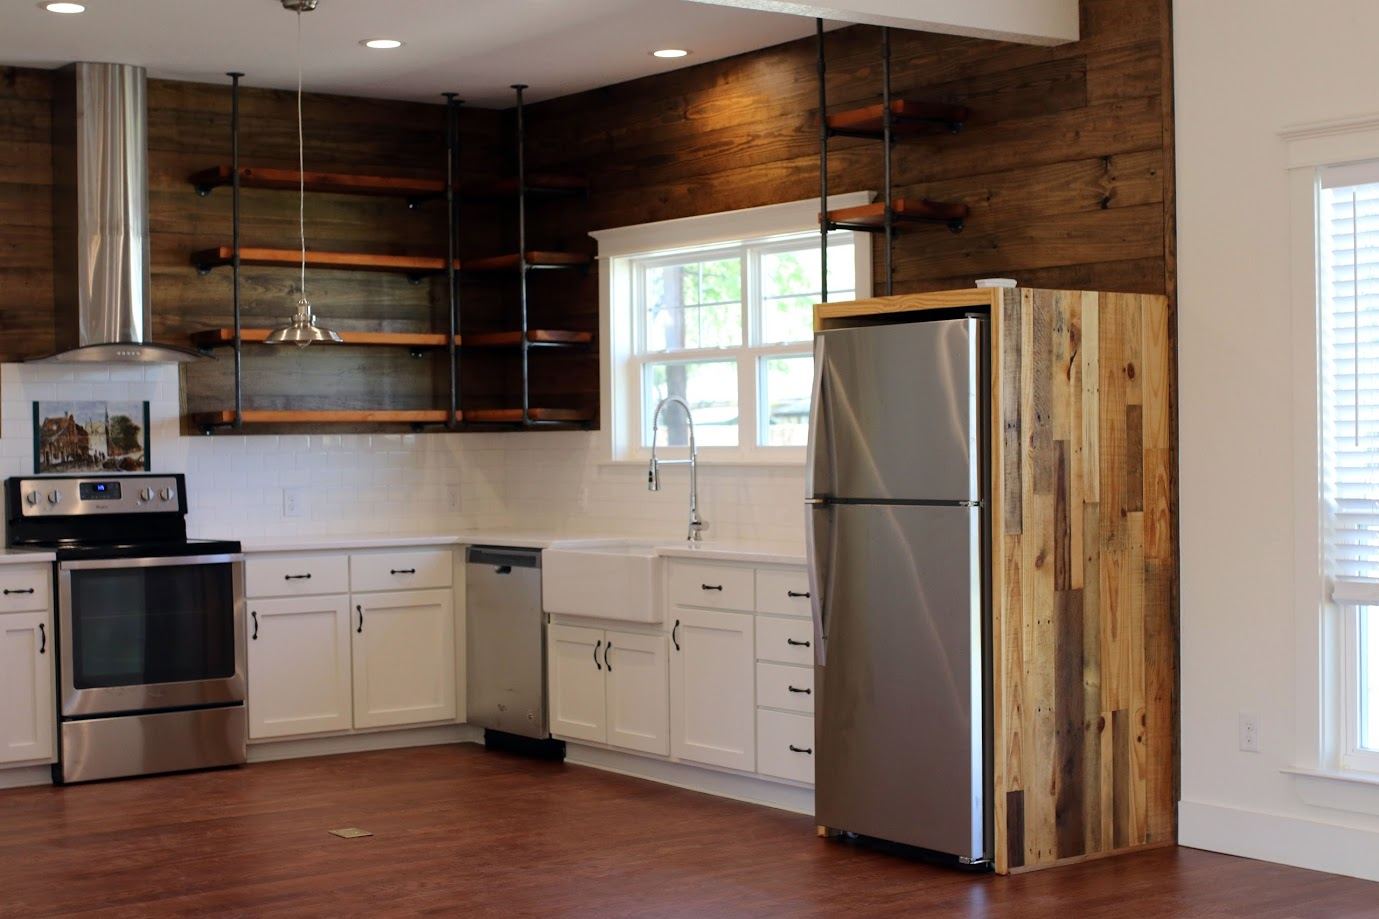 Remodel Farm Kitchen - Coates Lovett Coates